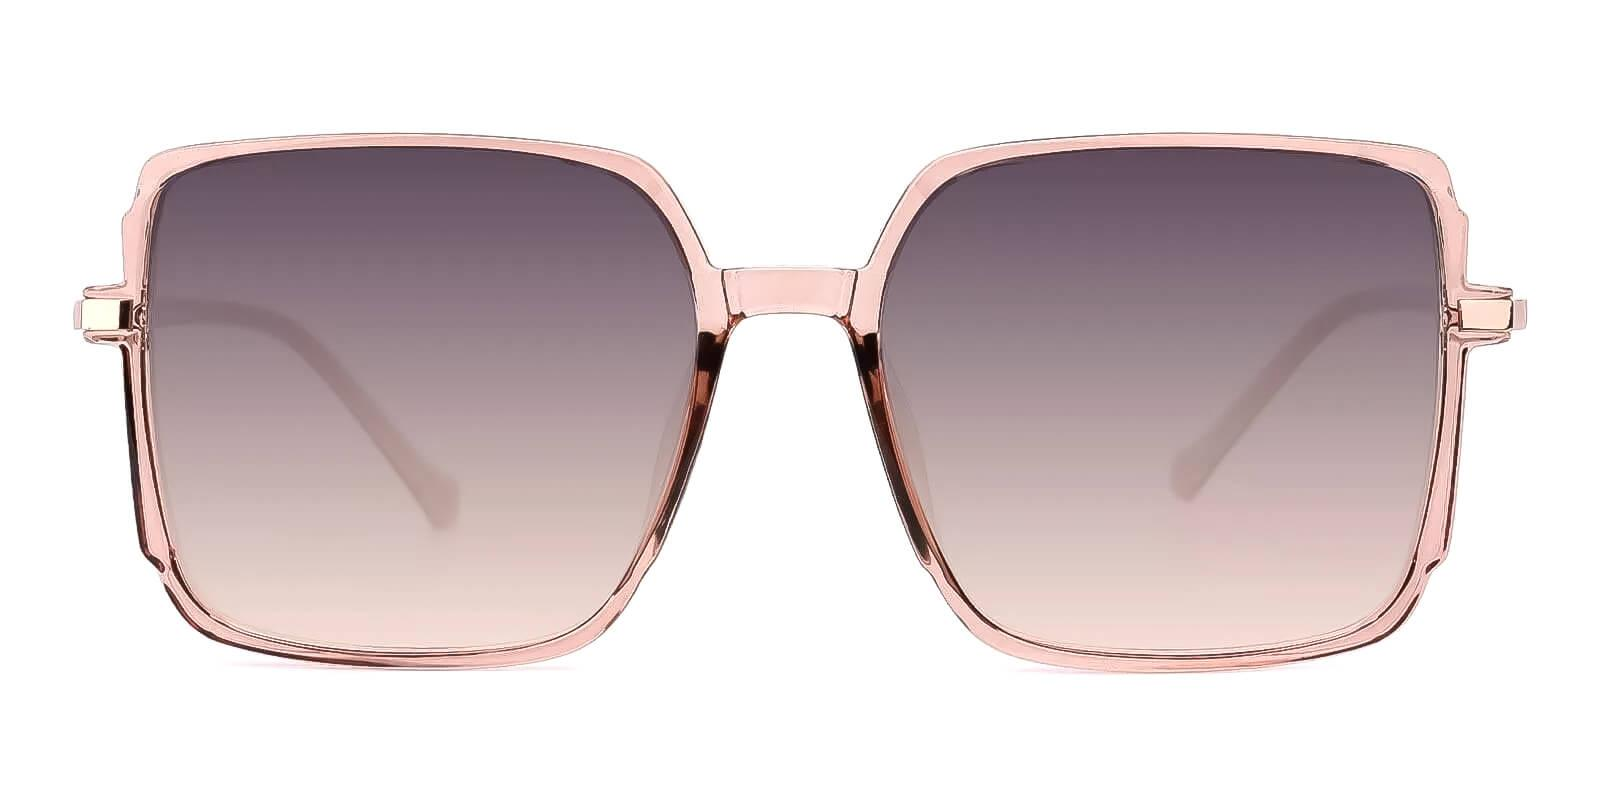 Quest Brown TR Fashion , Sunglasses , UniversalBridgeFit Frames from ABBE Glasses